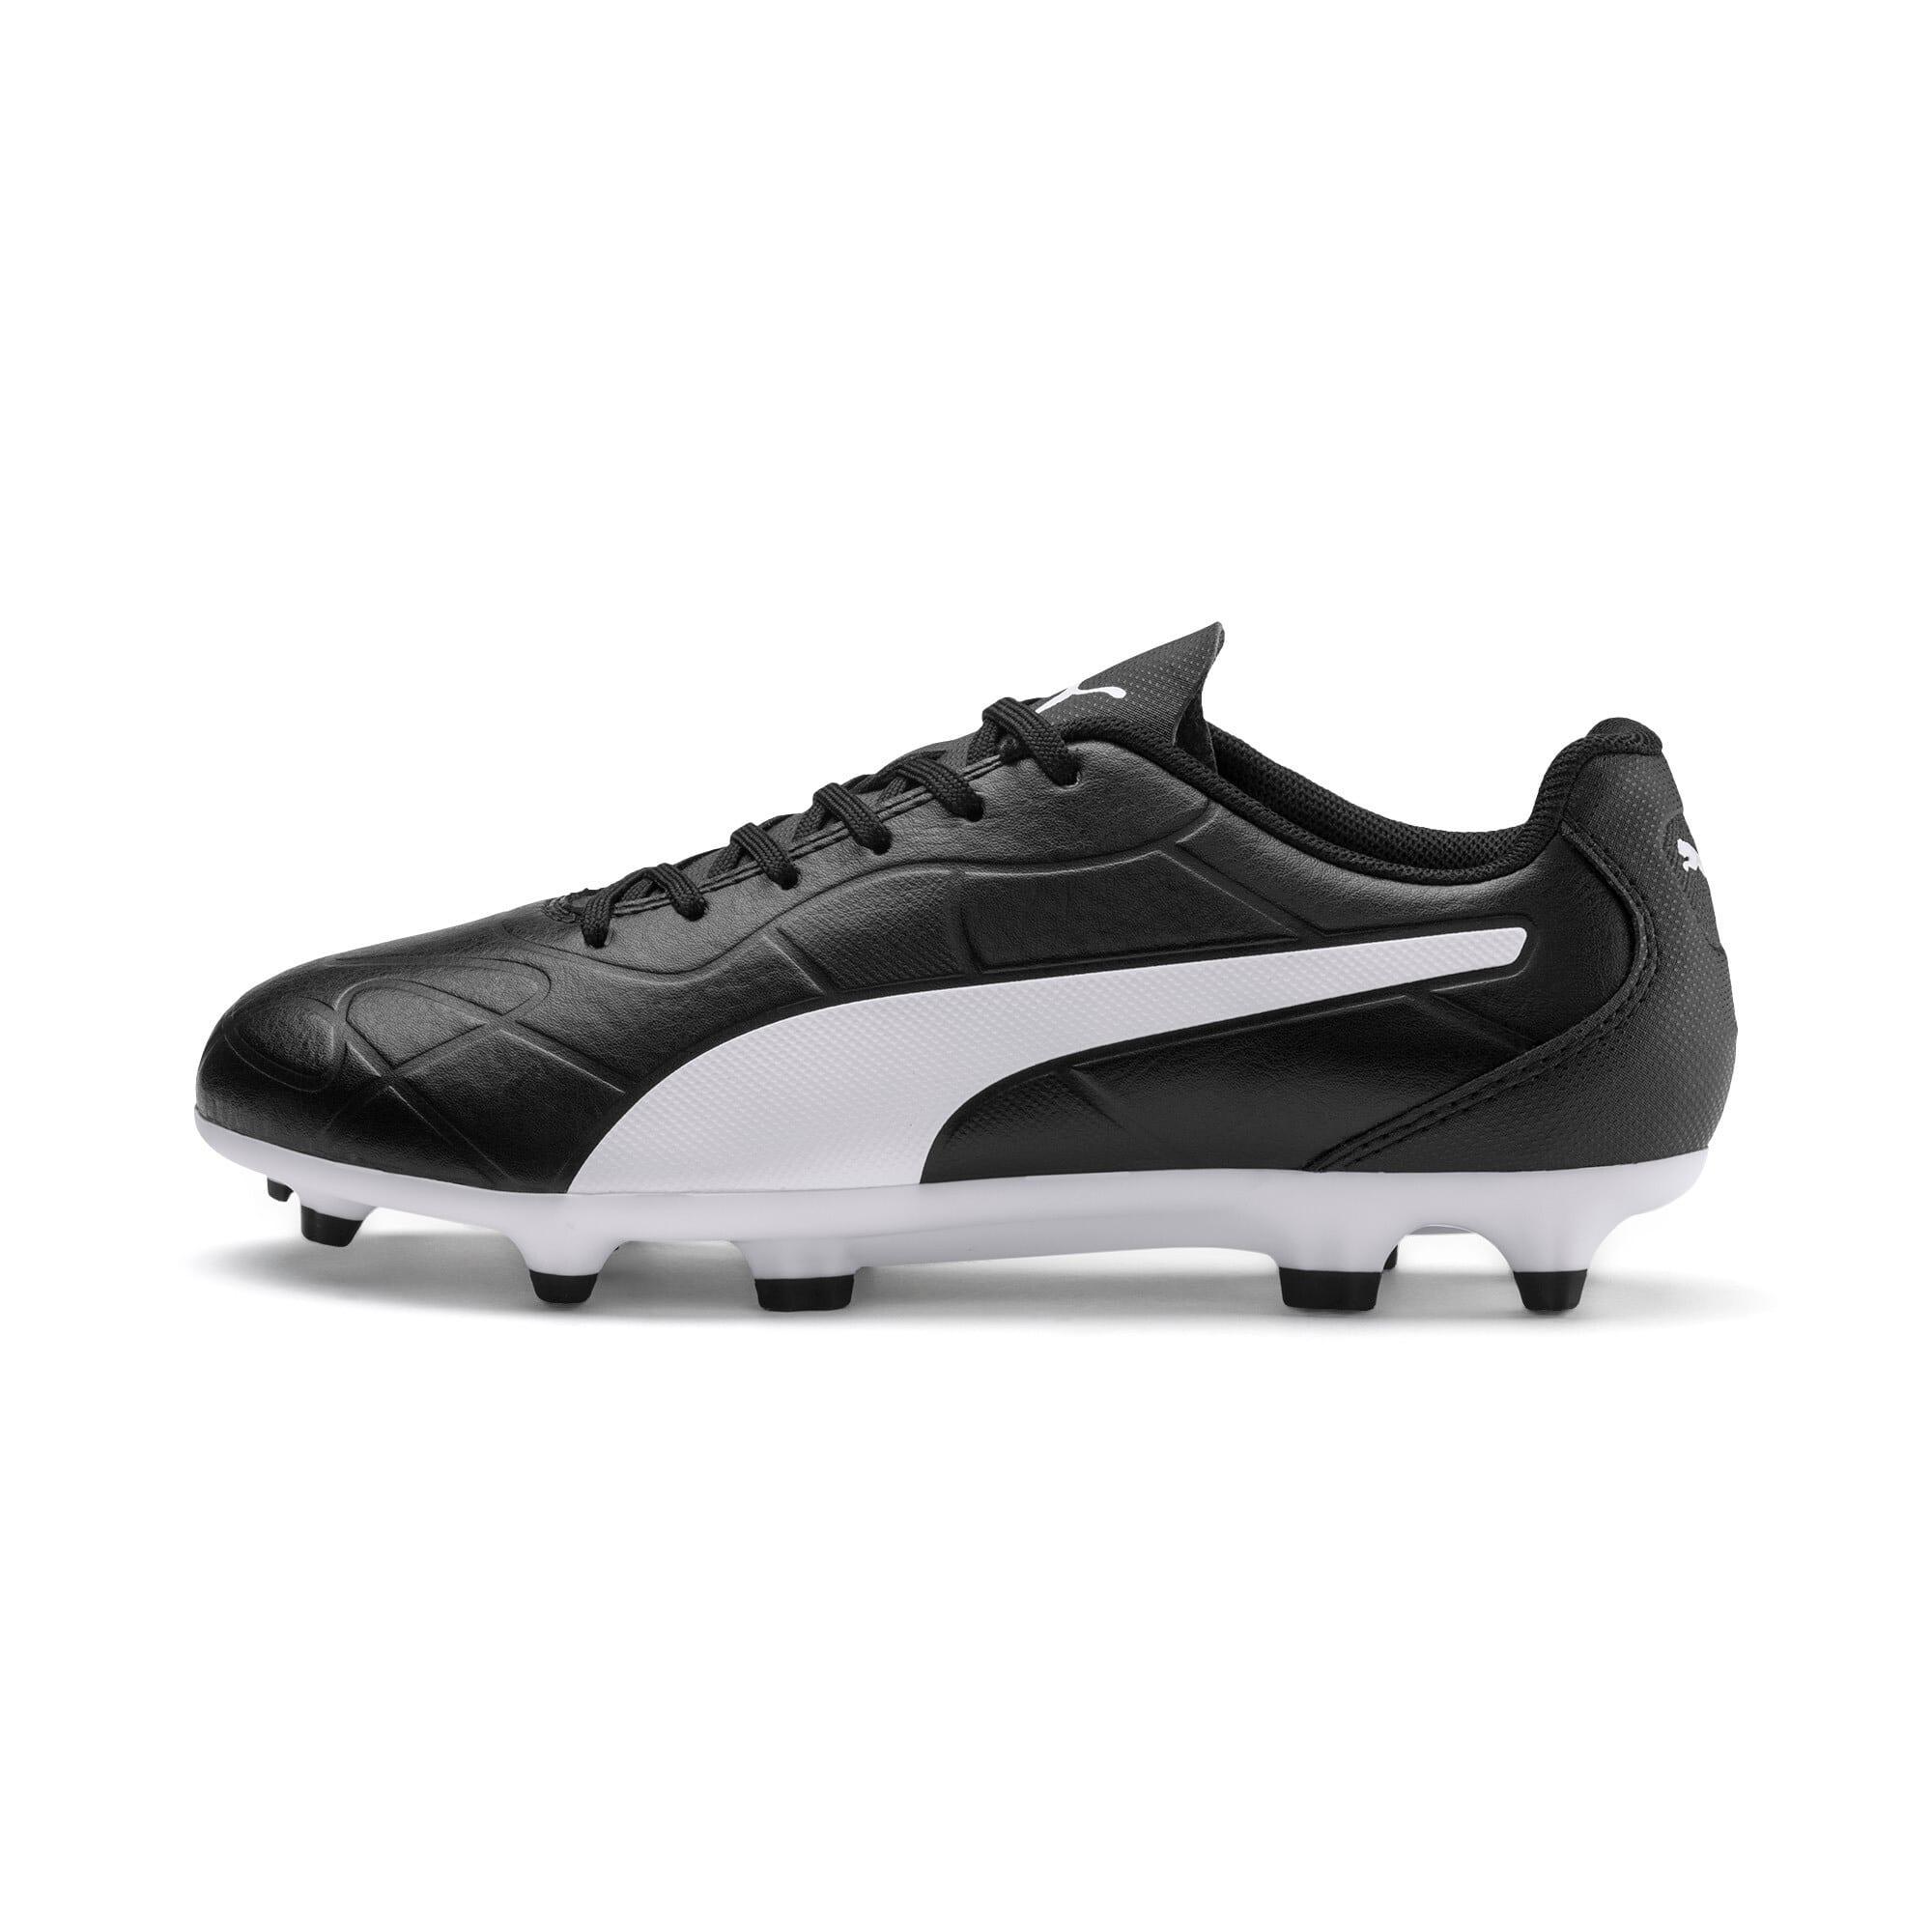 Thumbnail 1 of Monarch FG Youth Football Boots, Puma Black-Puma White, medium